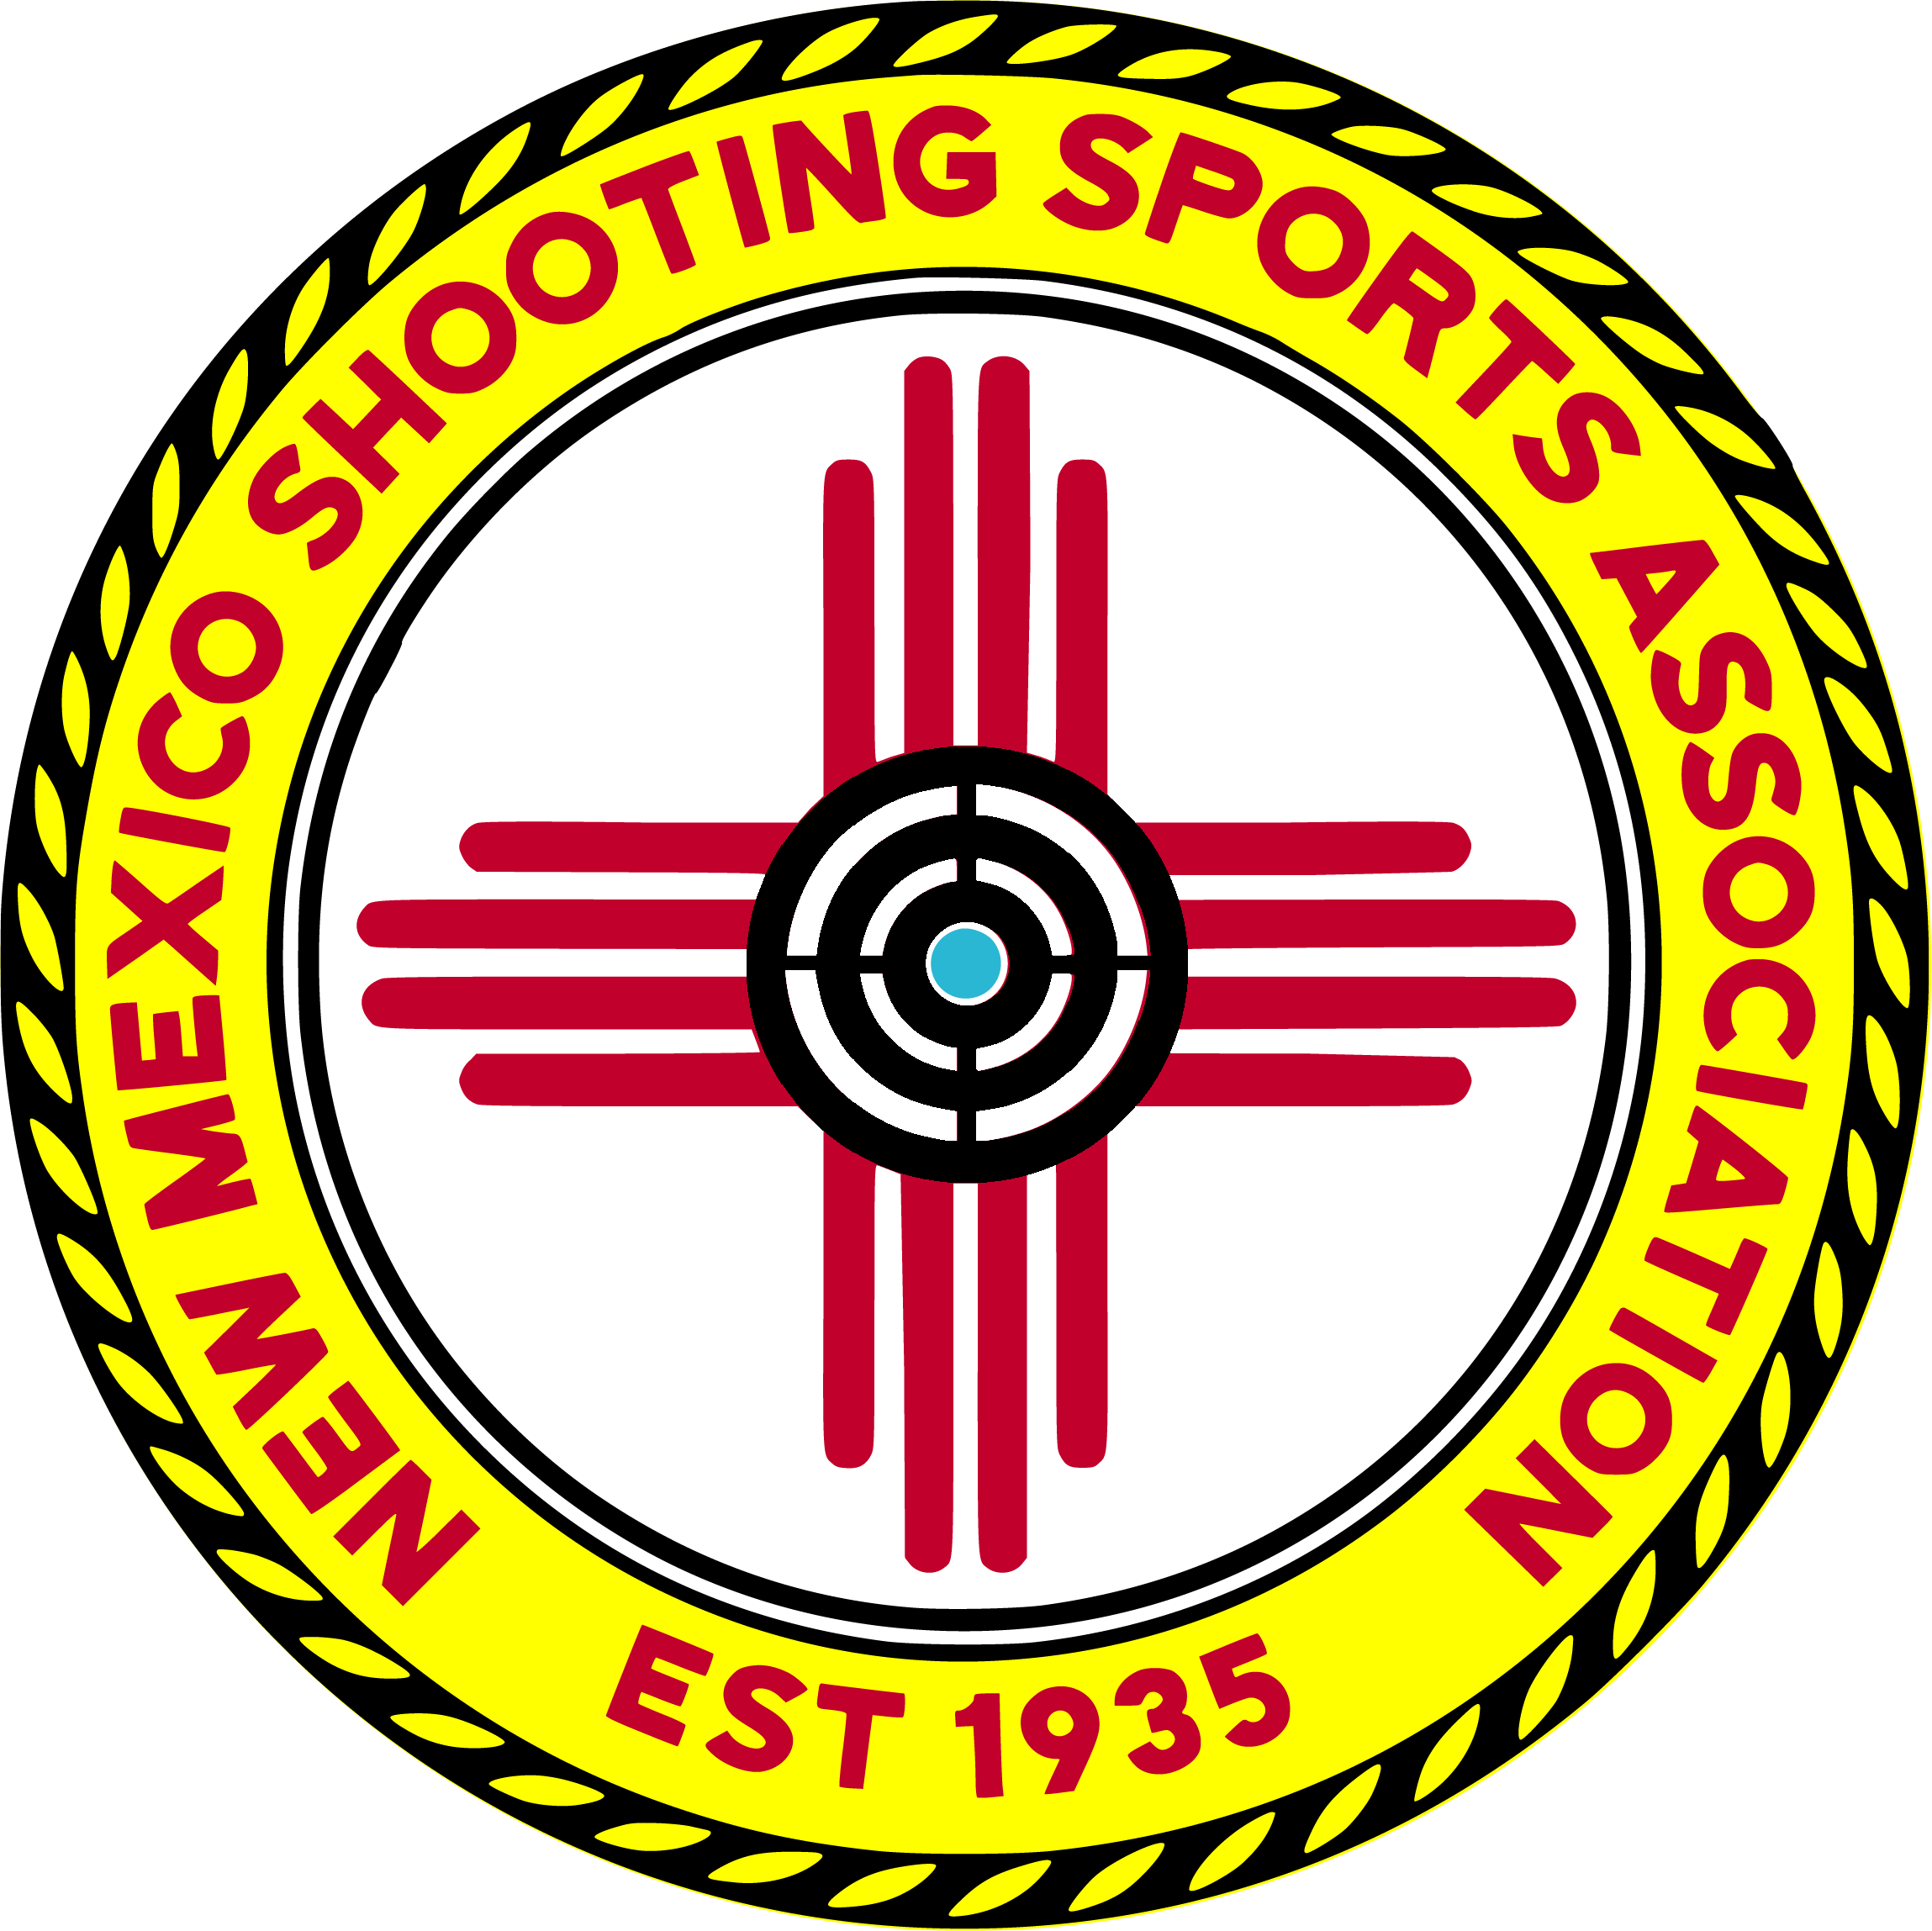 New Mexico Shooting Sports Association - NRA Sanction Organization